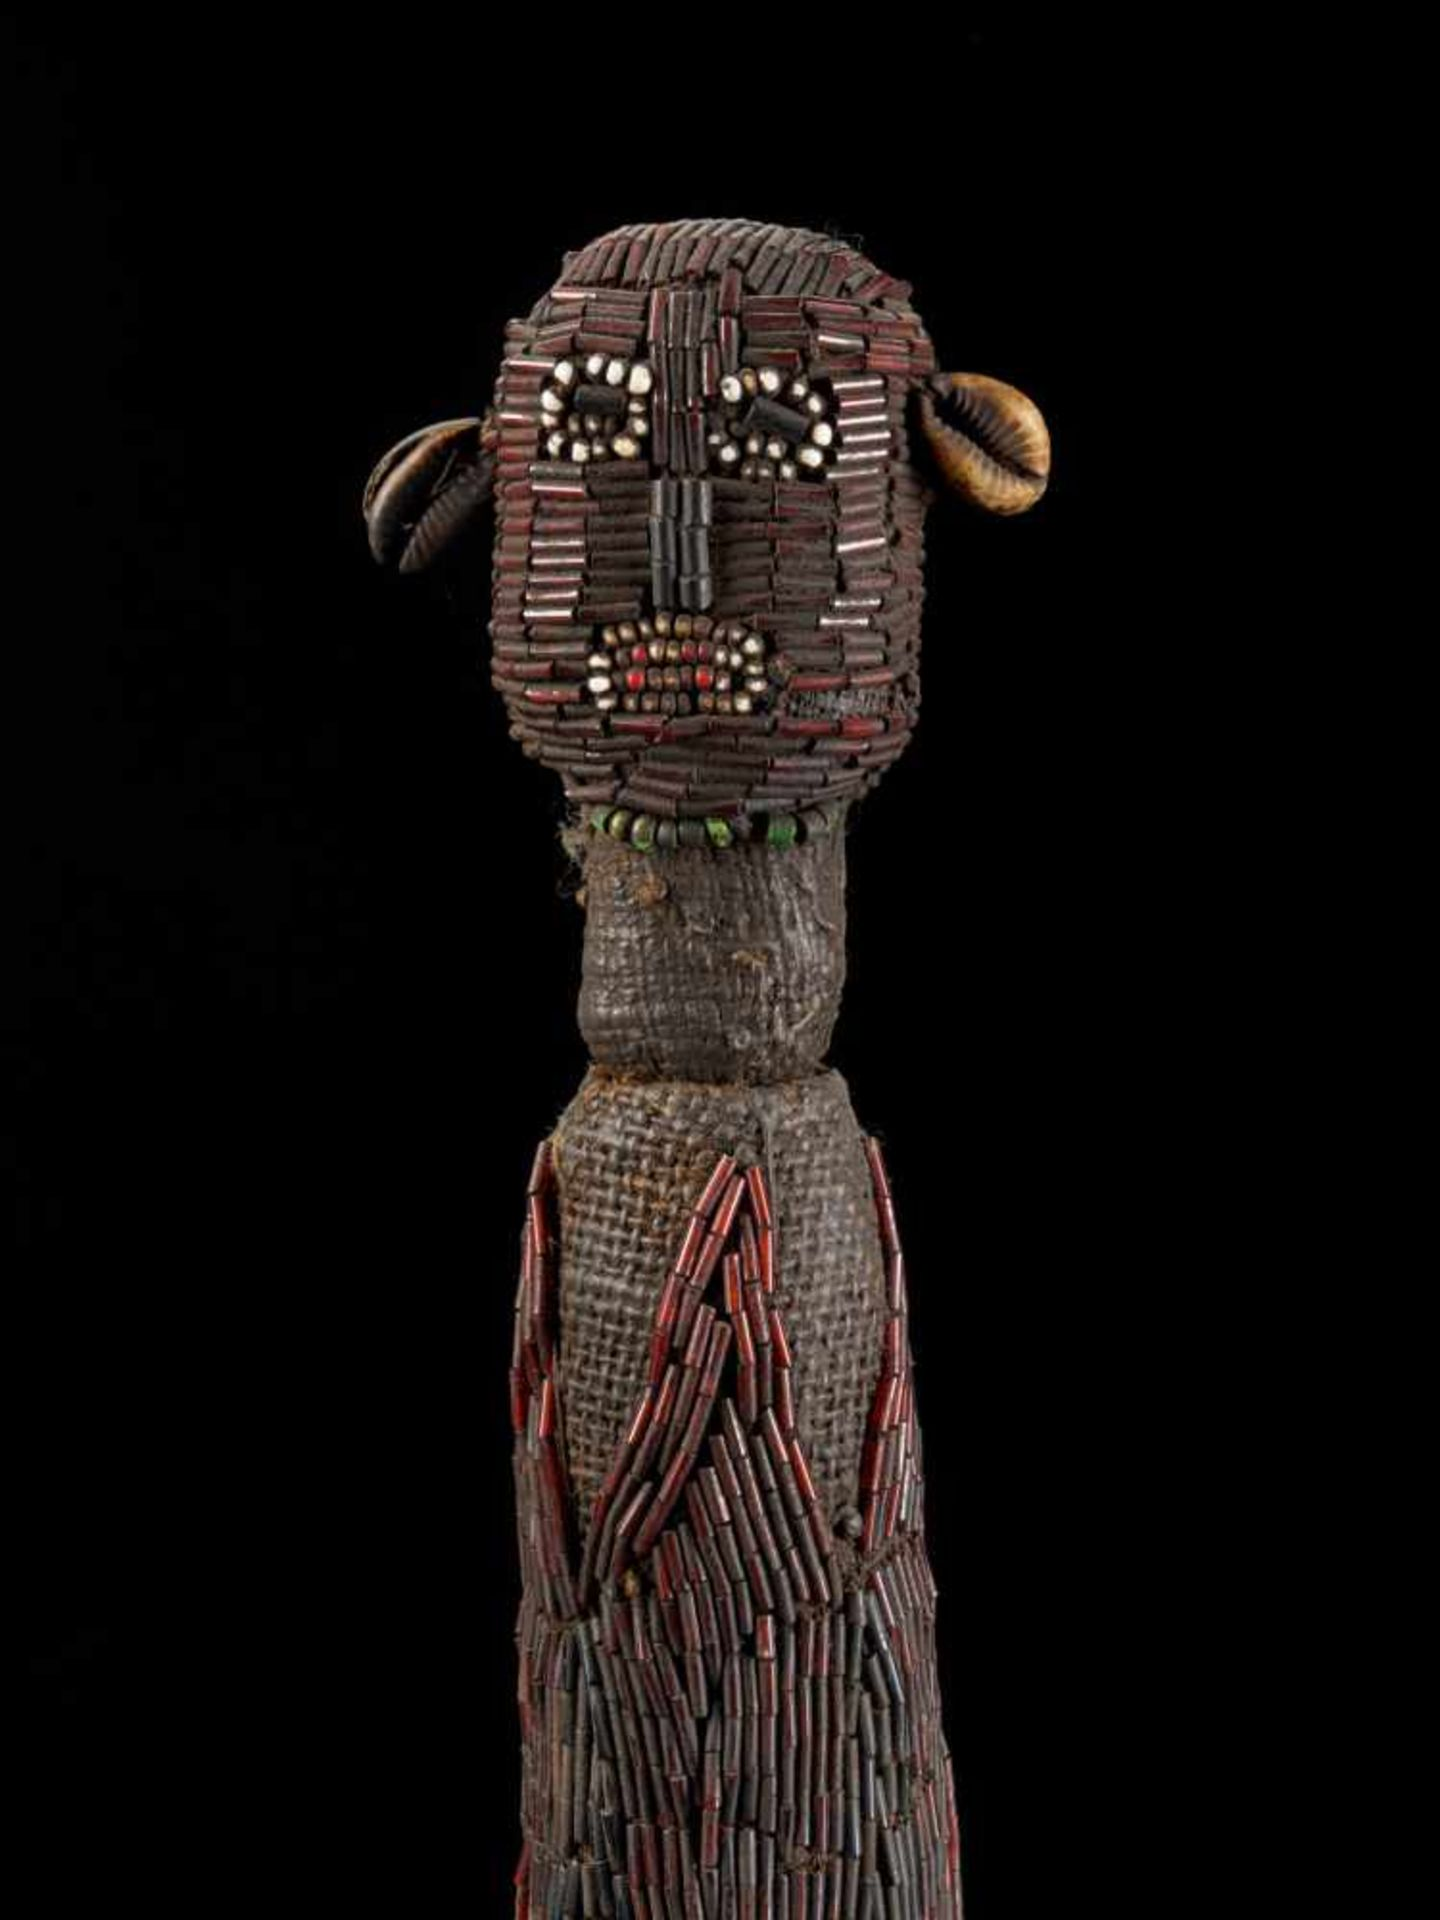 Beaded Palm Wine Vessel Topped With Human Figure - Tribal ArtThis impressive beaded wine vessel is - Bild 8 aus 8